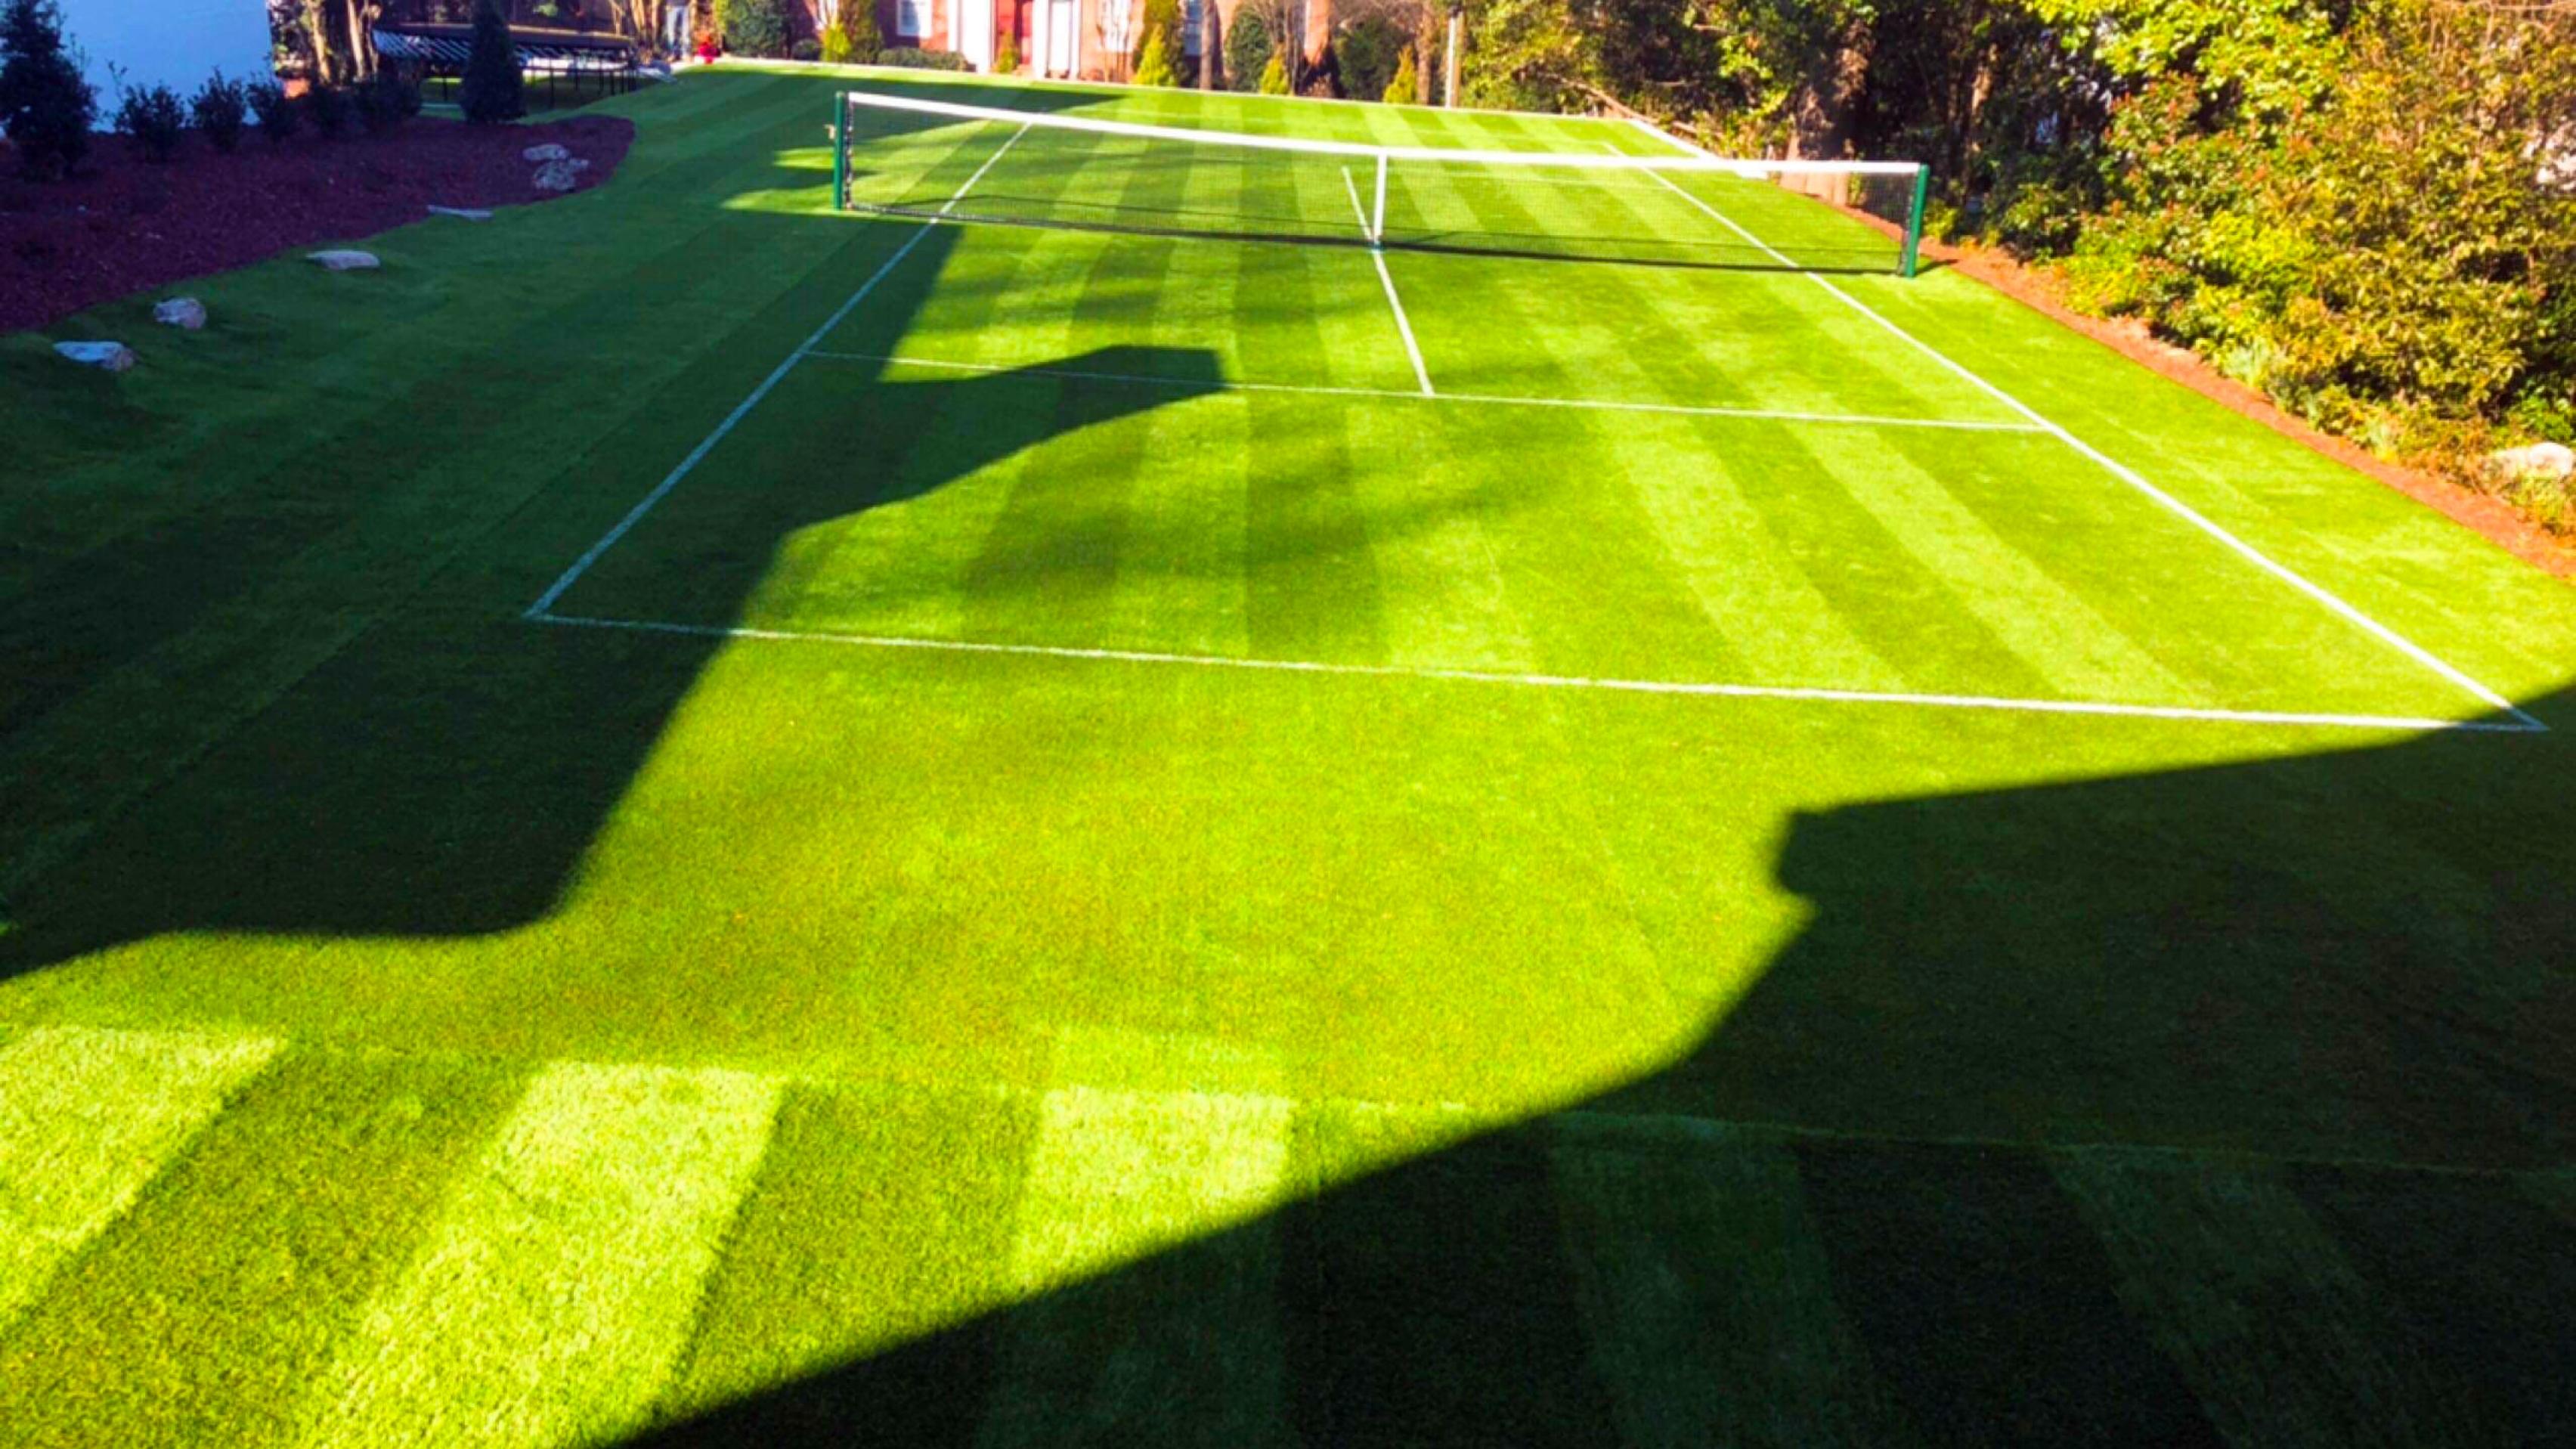 Backyard Tennis Court Artificial Grass Synthetic Turf